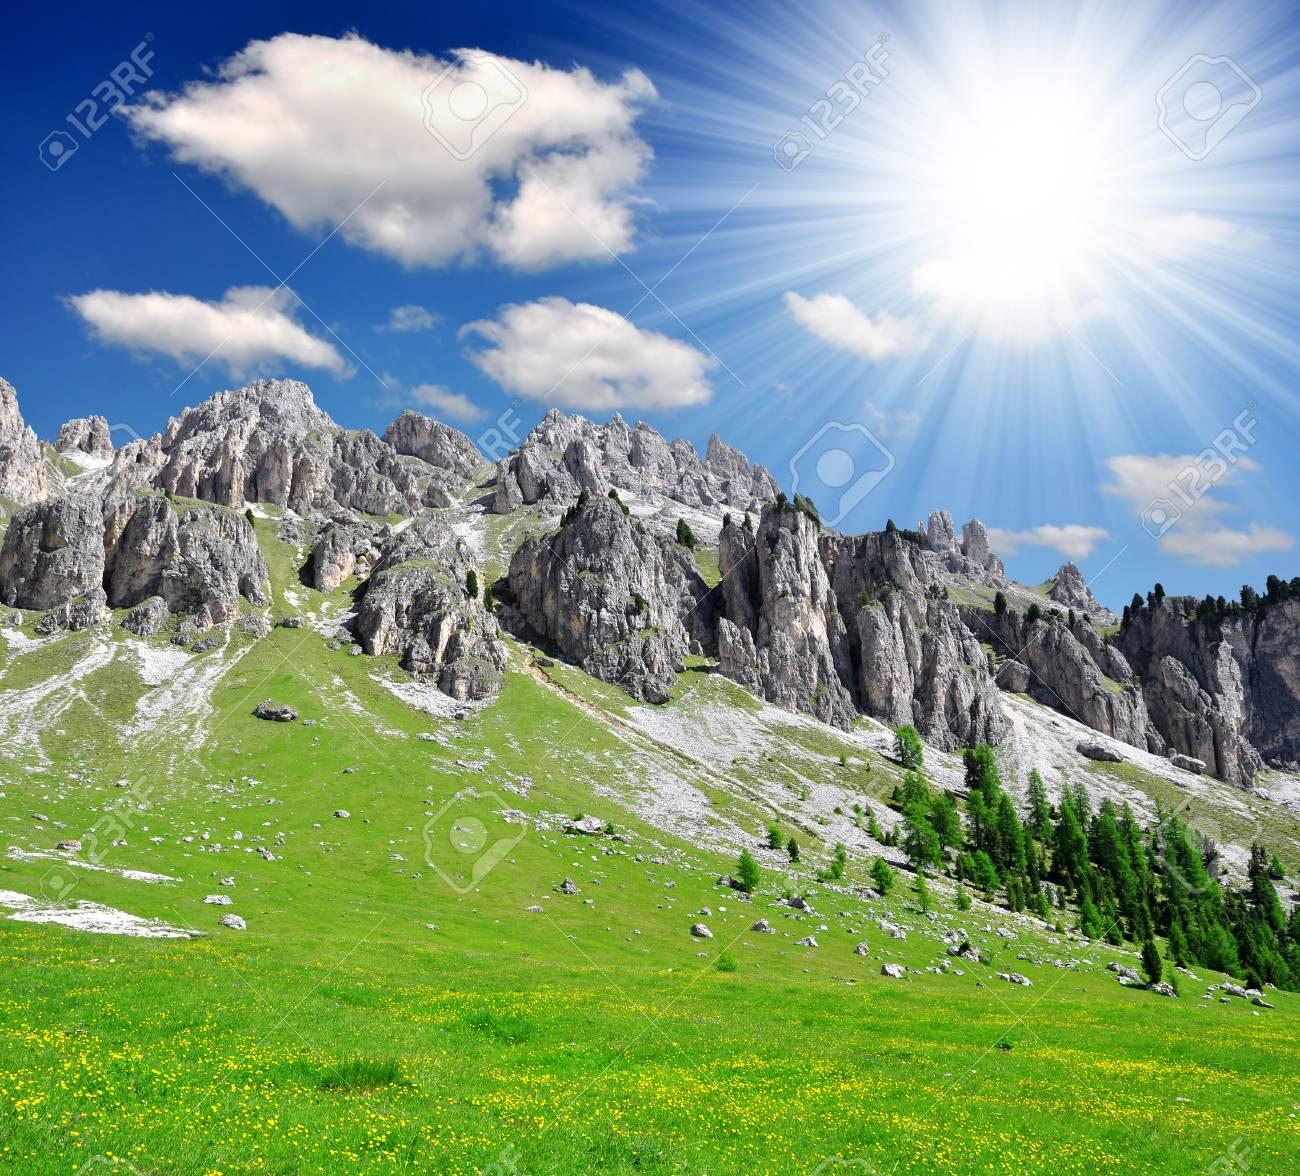 Dolomite peaks, Rosengarten,Val di Fassa, Italy Alps Stock Photo - 15735619